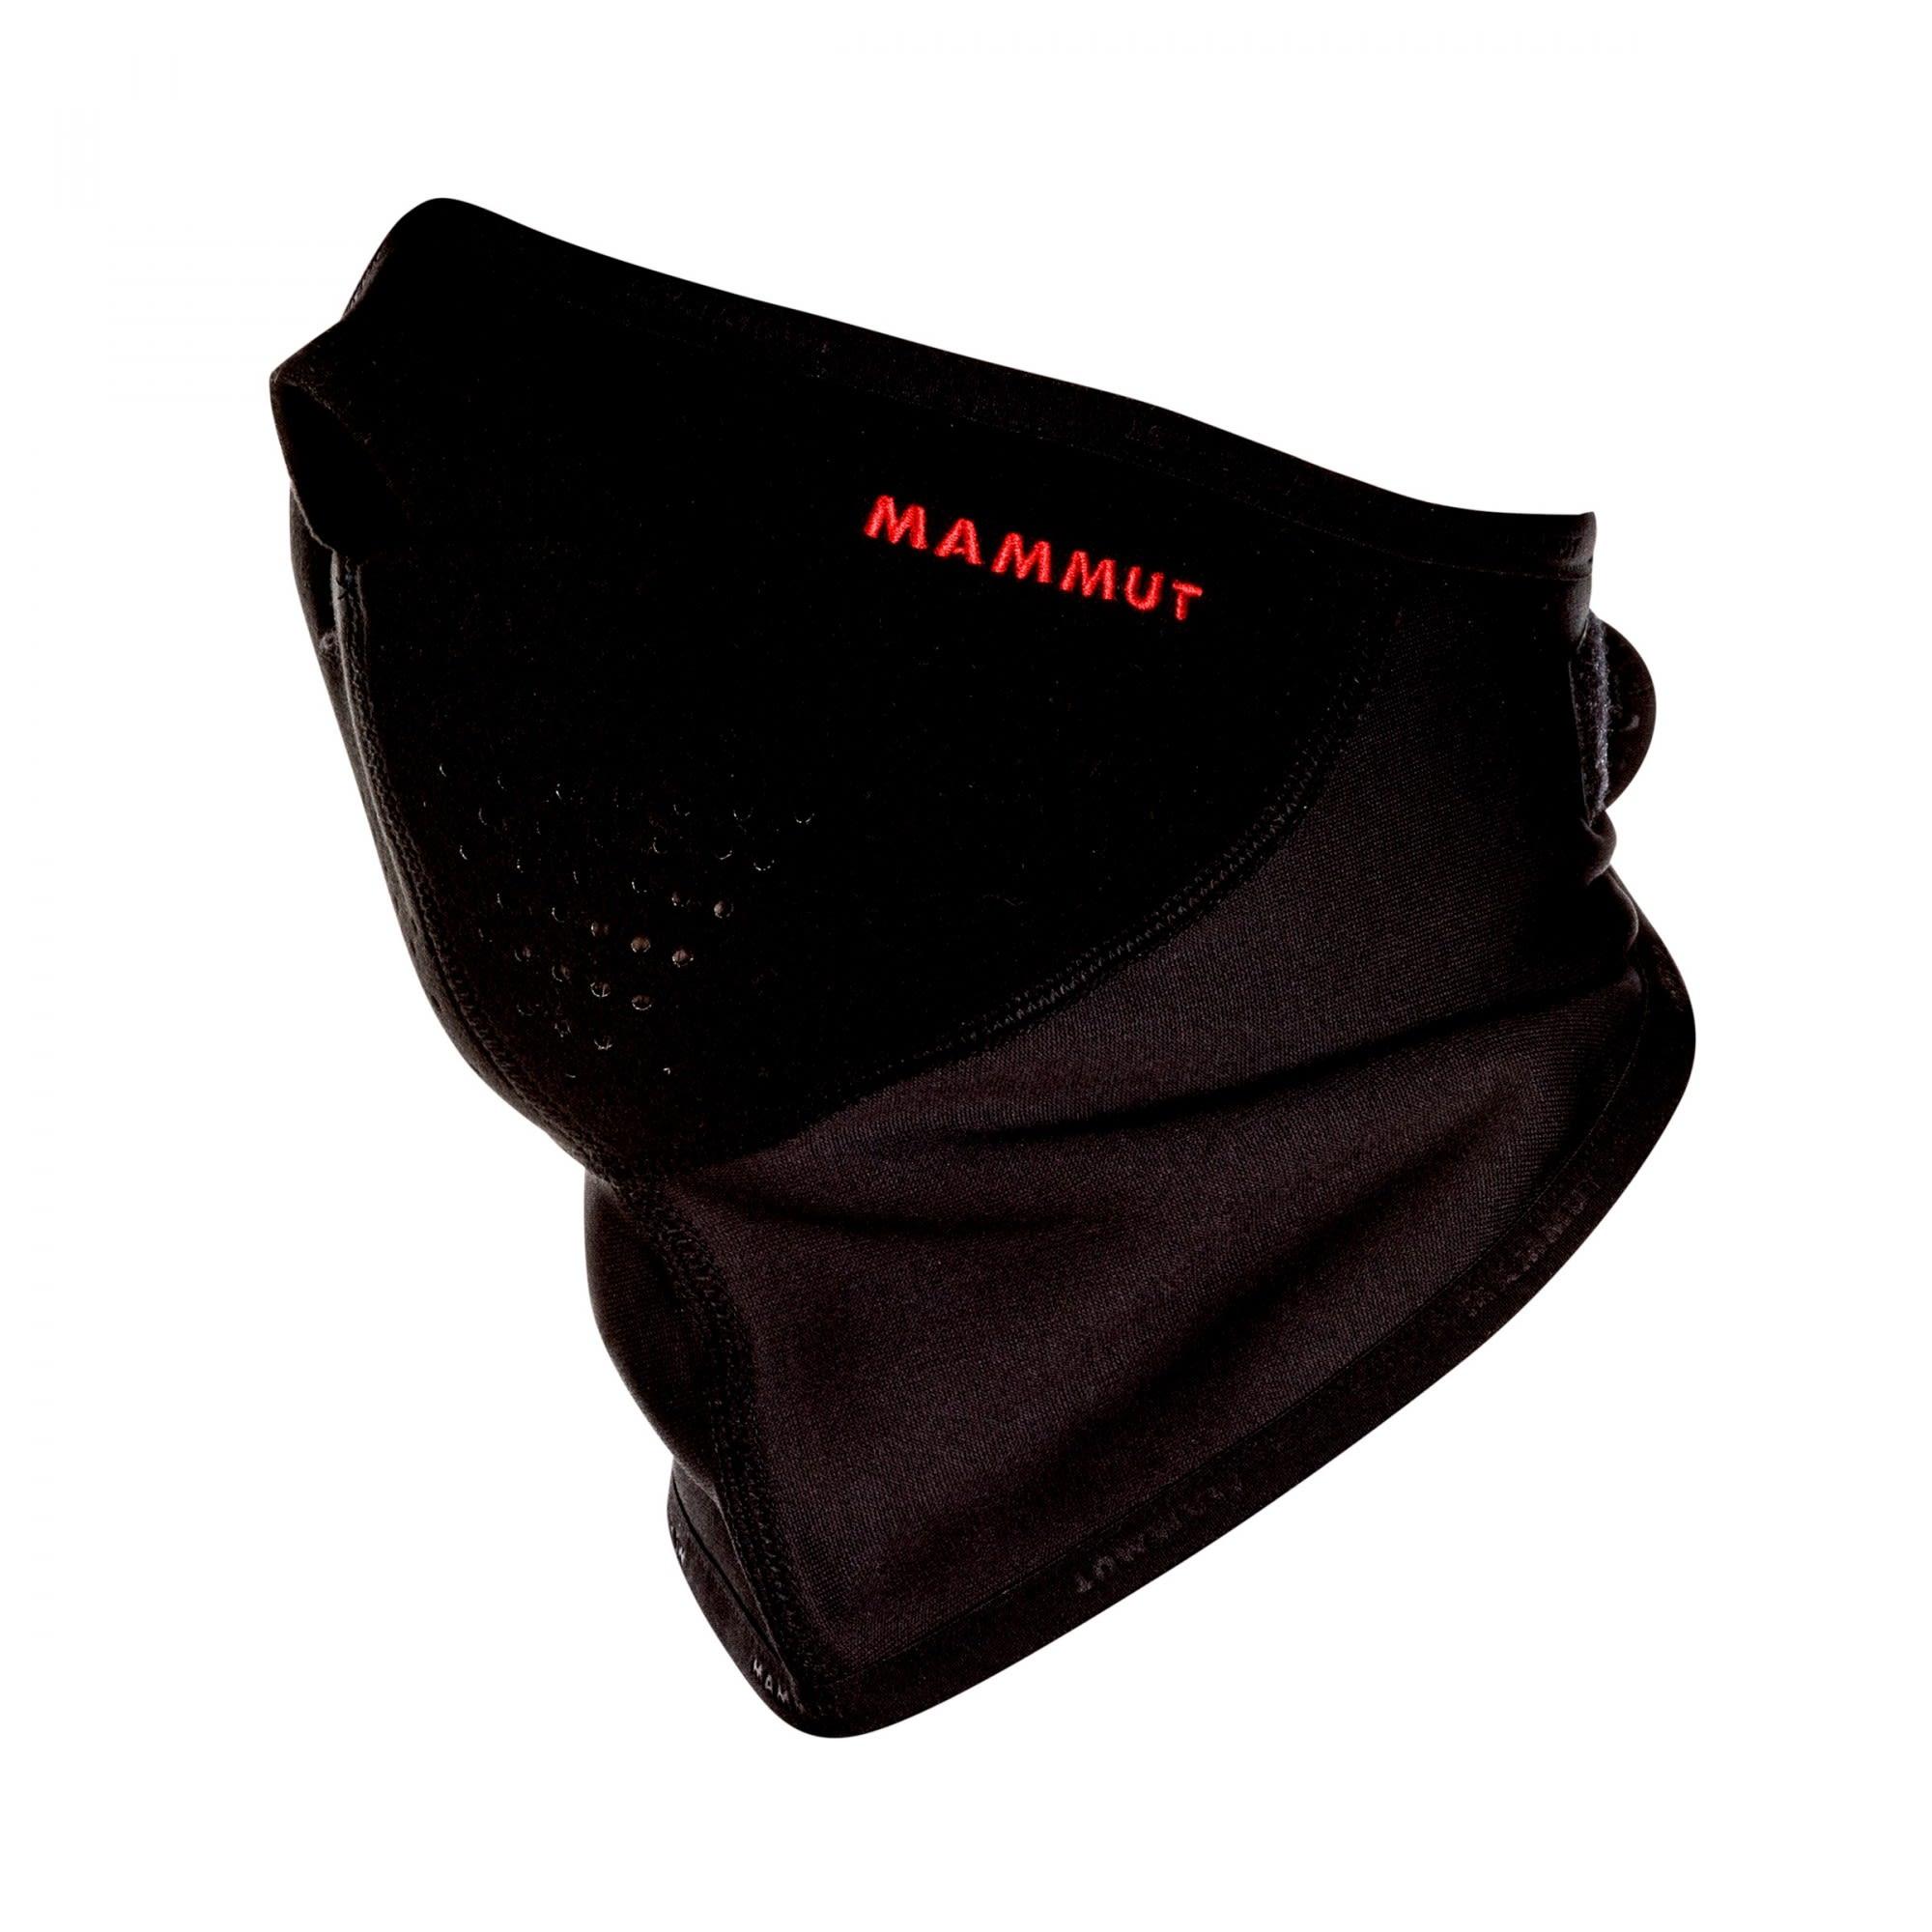 Mammut WS Mask Schwarz, Accessoires, One Size